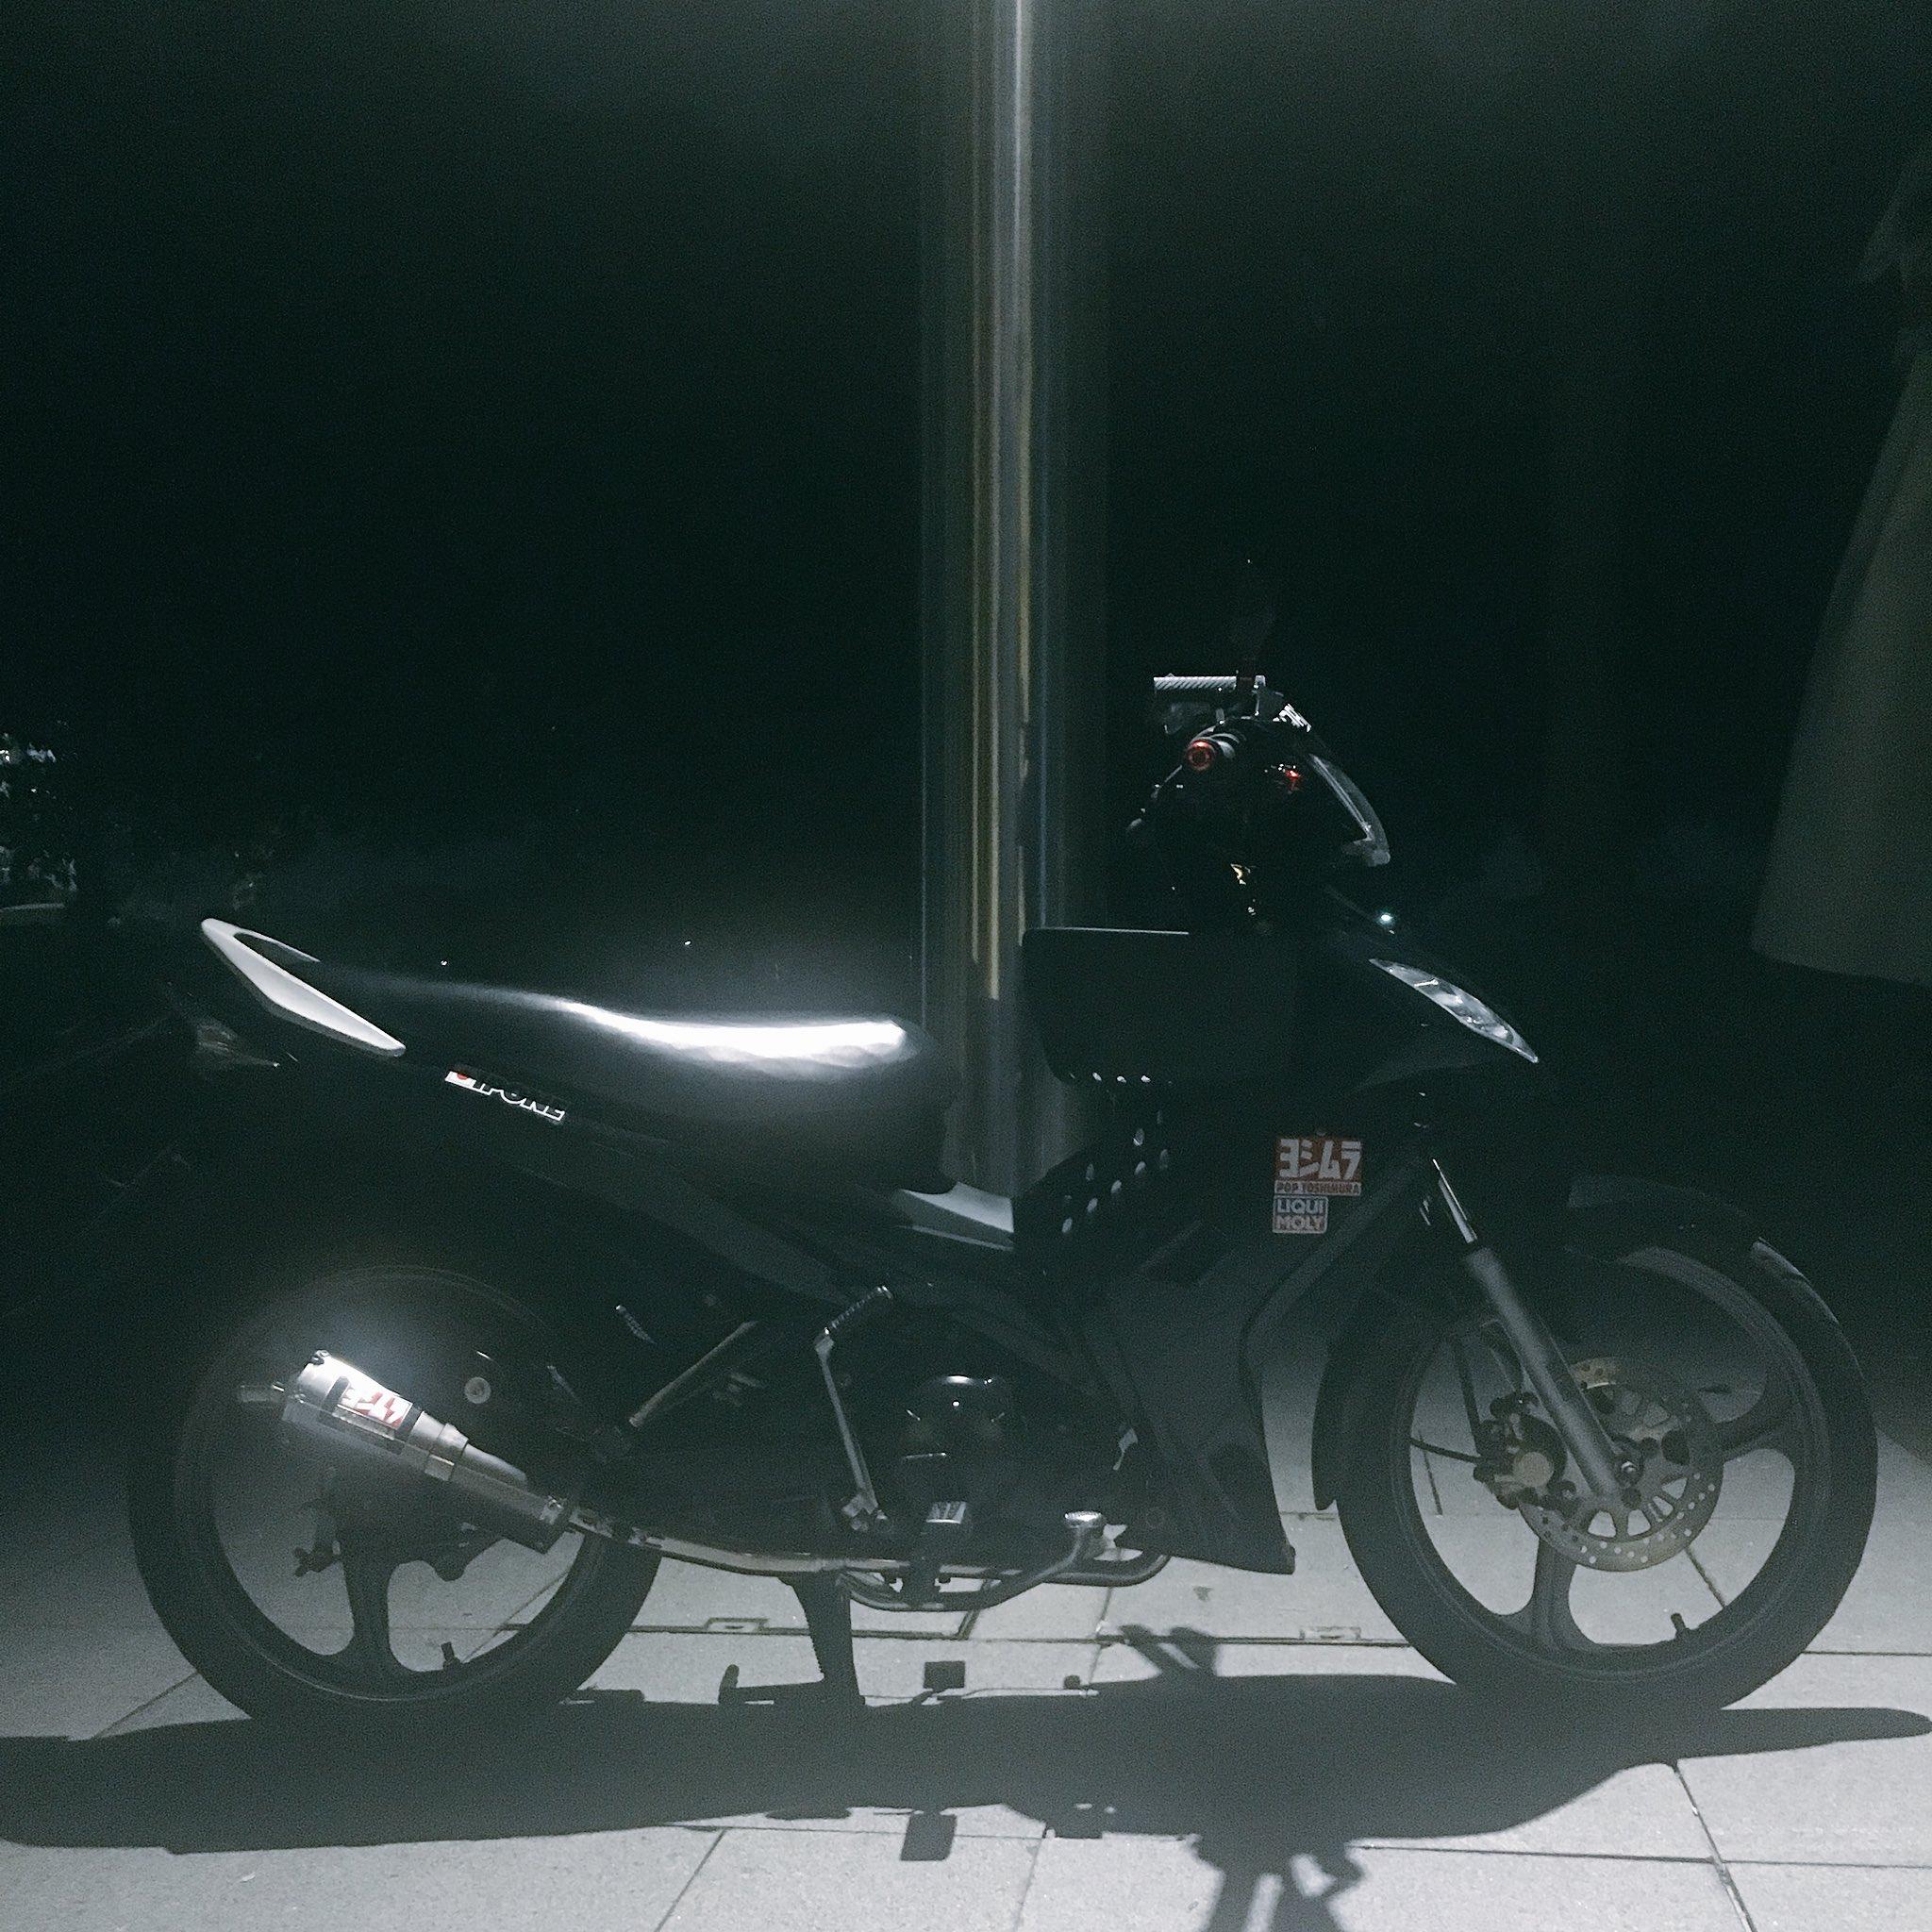 Alhamdullilah dapat jugak motor sendiri ������ https://t.co/ELAnxLfZGA